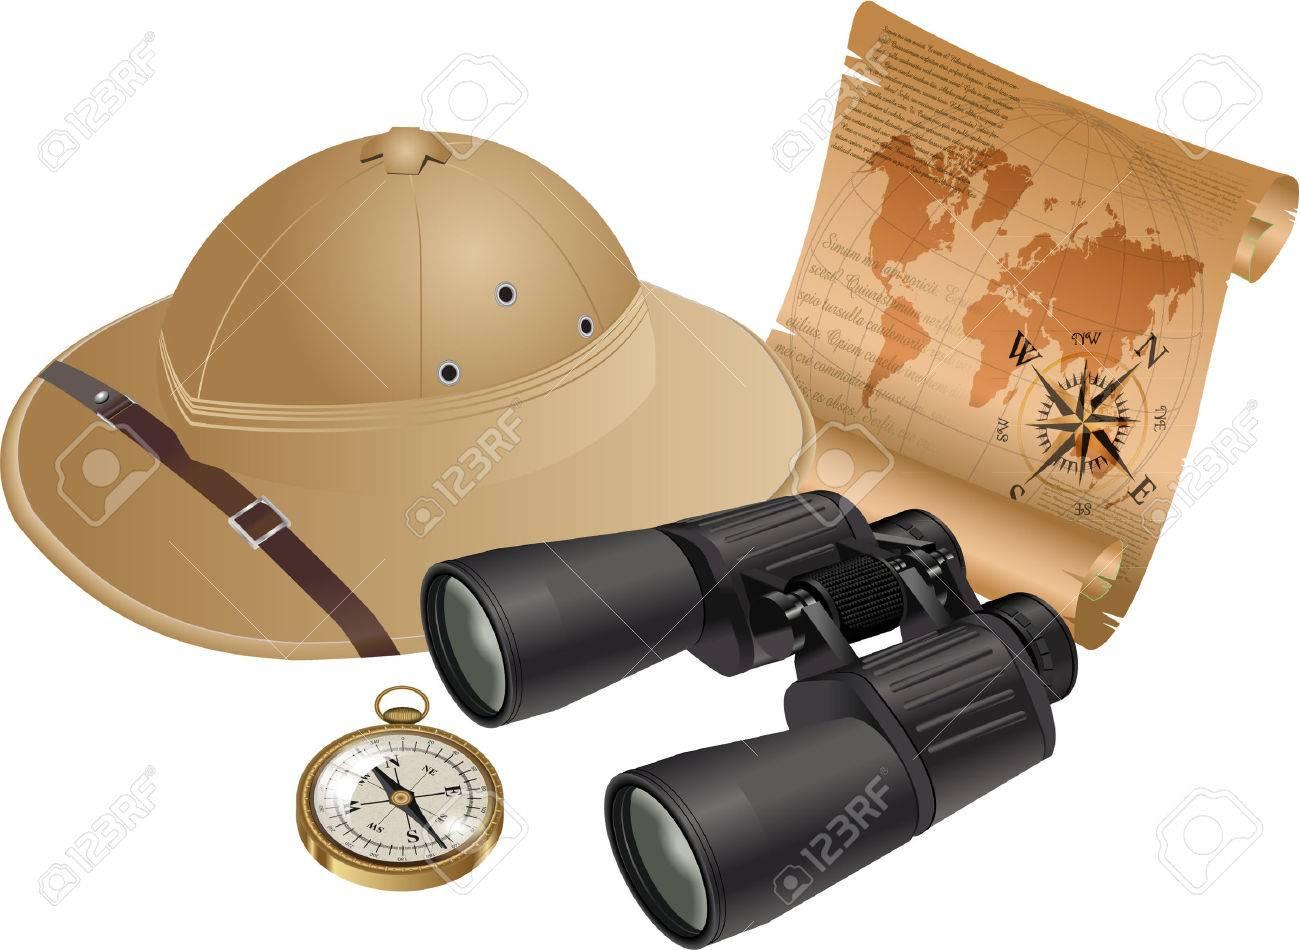 explorer - 30823418